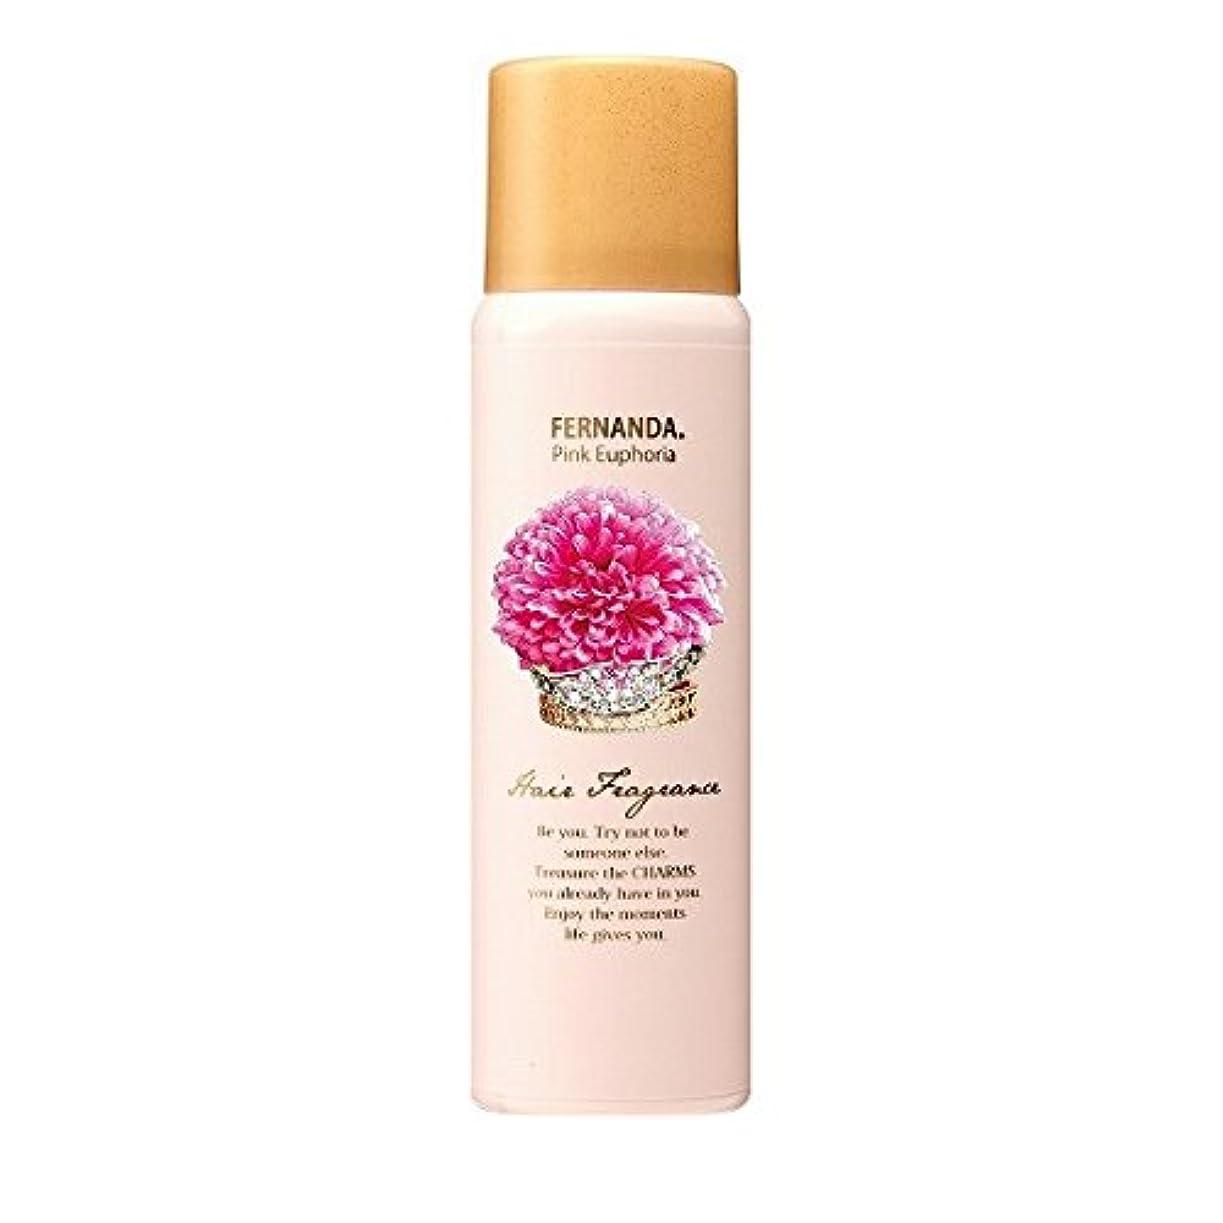 FERNANDA(フェルナンダ) Hair Fragrance Pink Euphoria (ヘアー フレグランス ピンクエウフォリア)